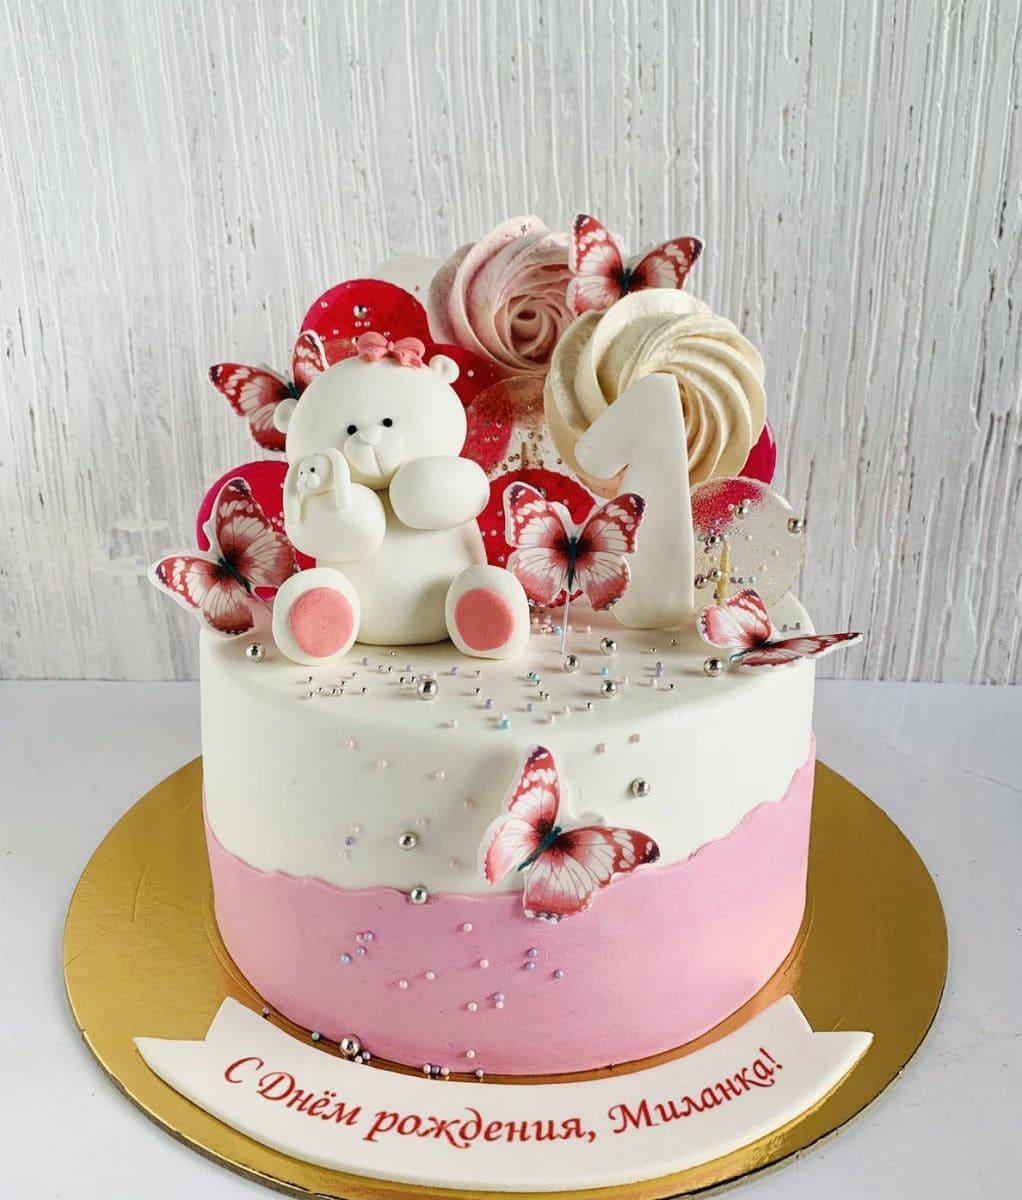 Торт мишка с бабочками заказать Минск, цена, фото